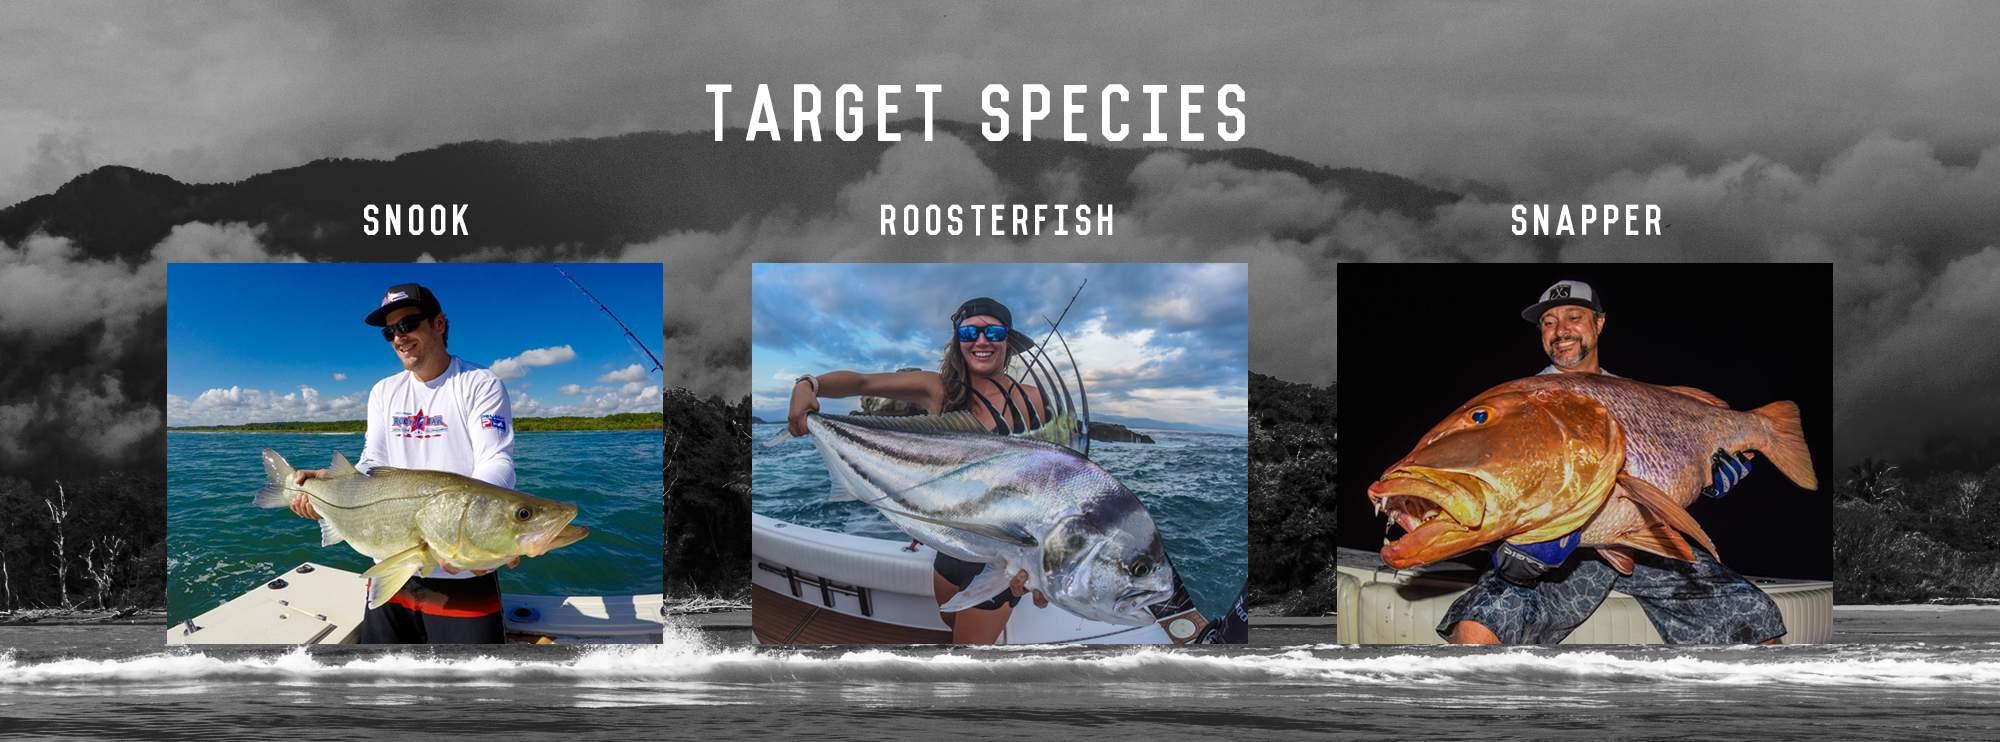 PELAGIC Pura Vida Inshore Classic_Snook_Roosterfish_Snapper_Costa Rica